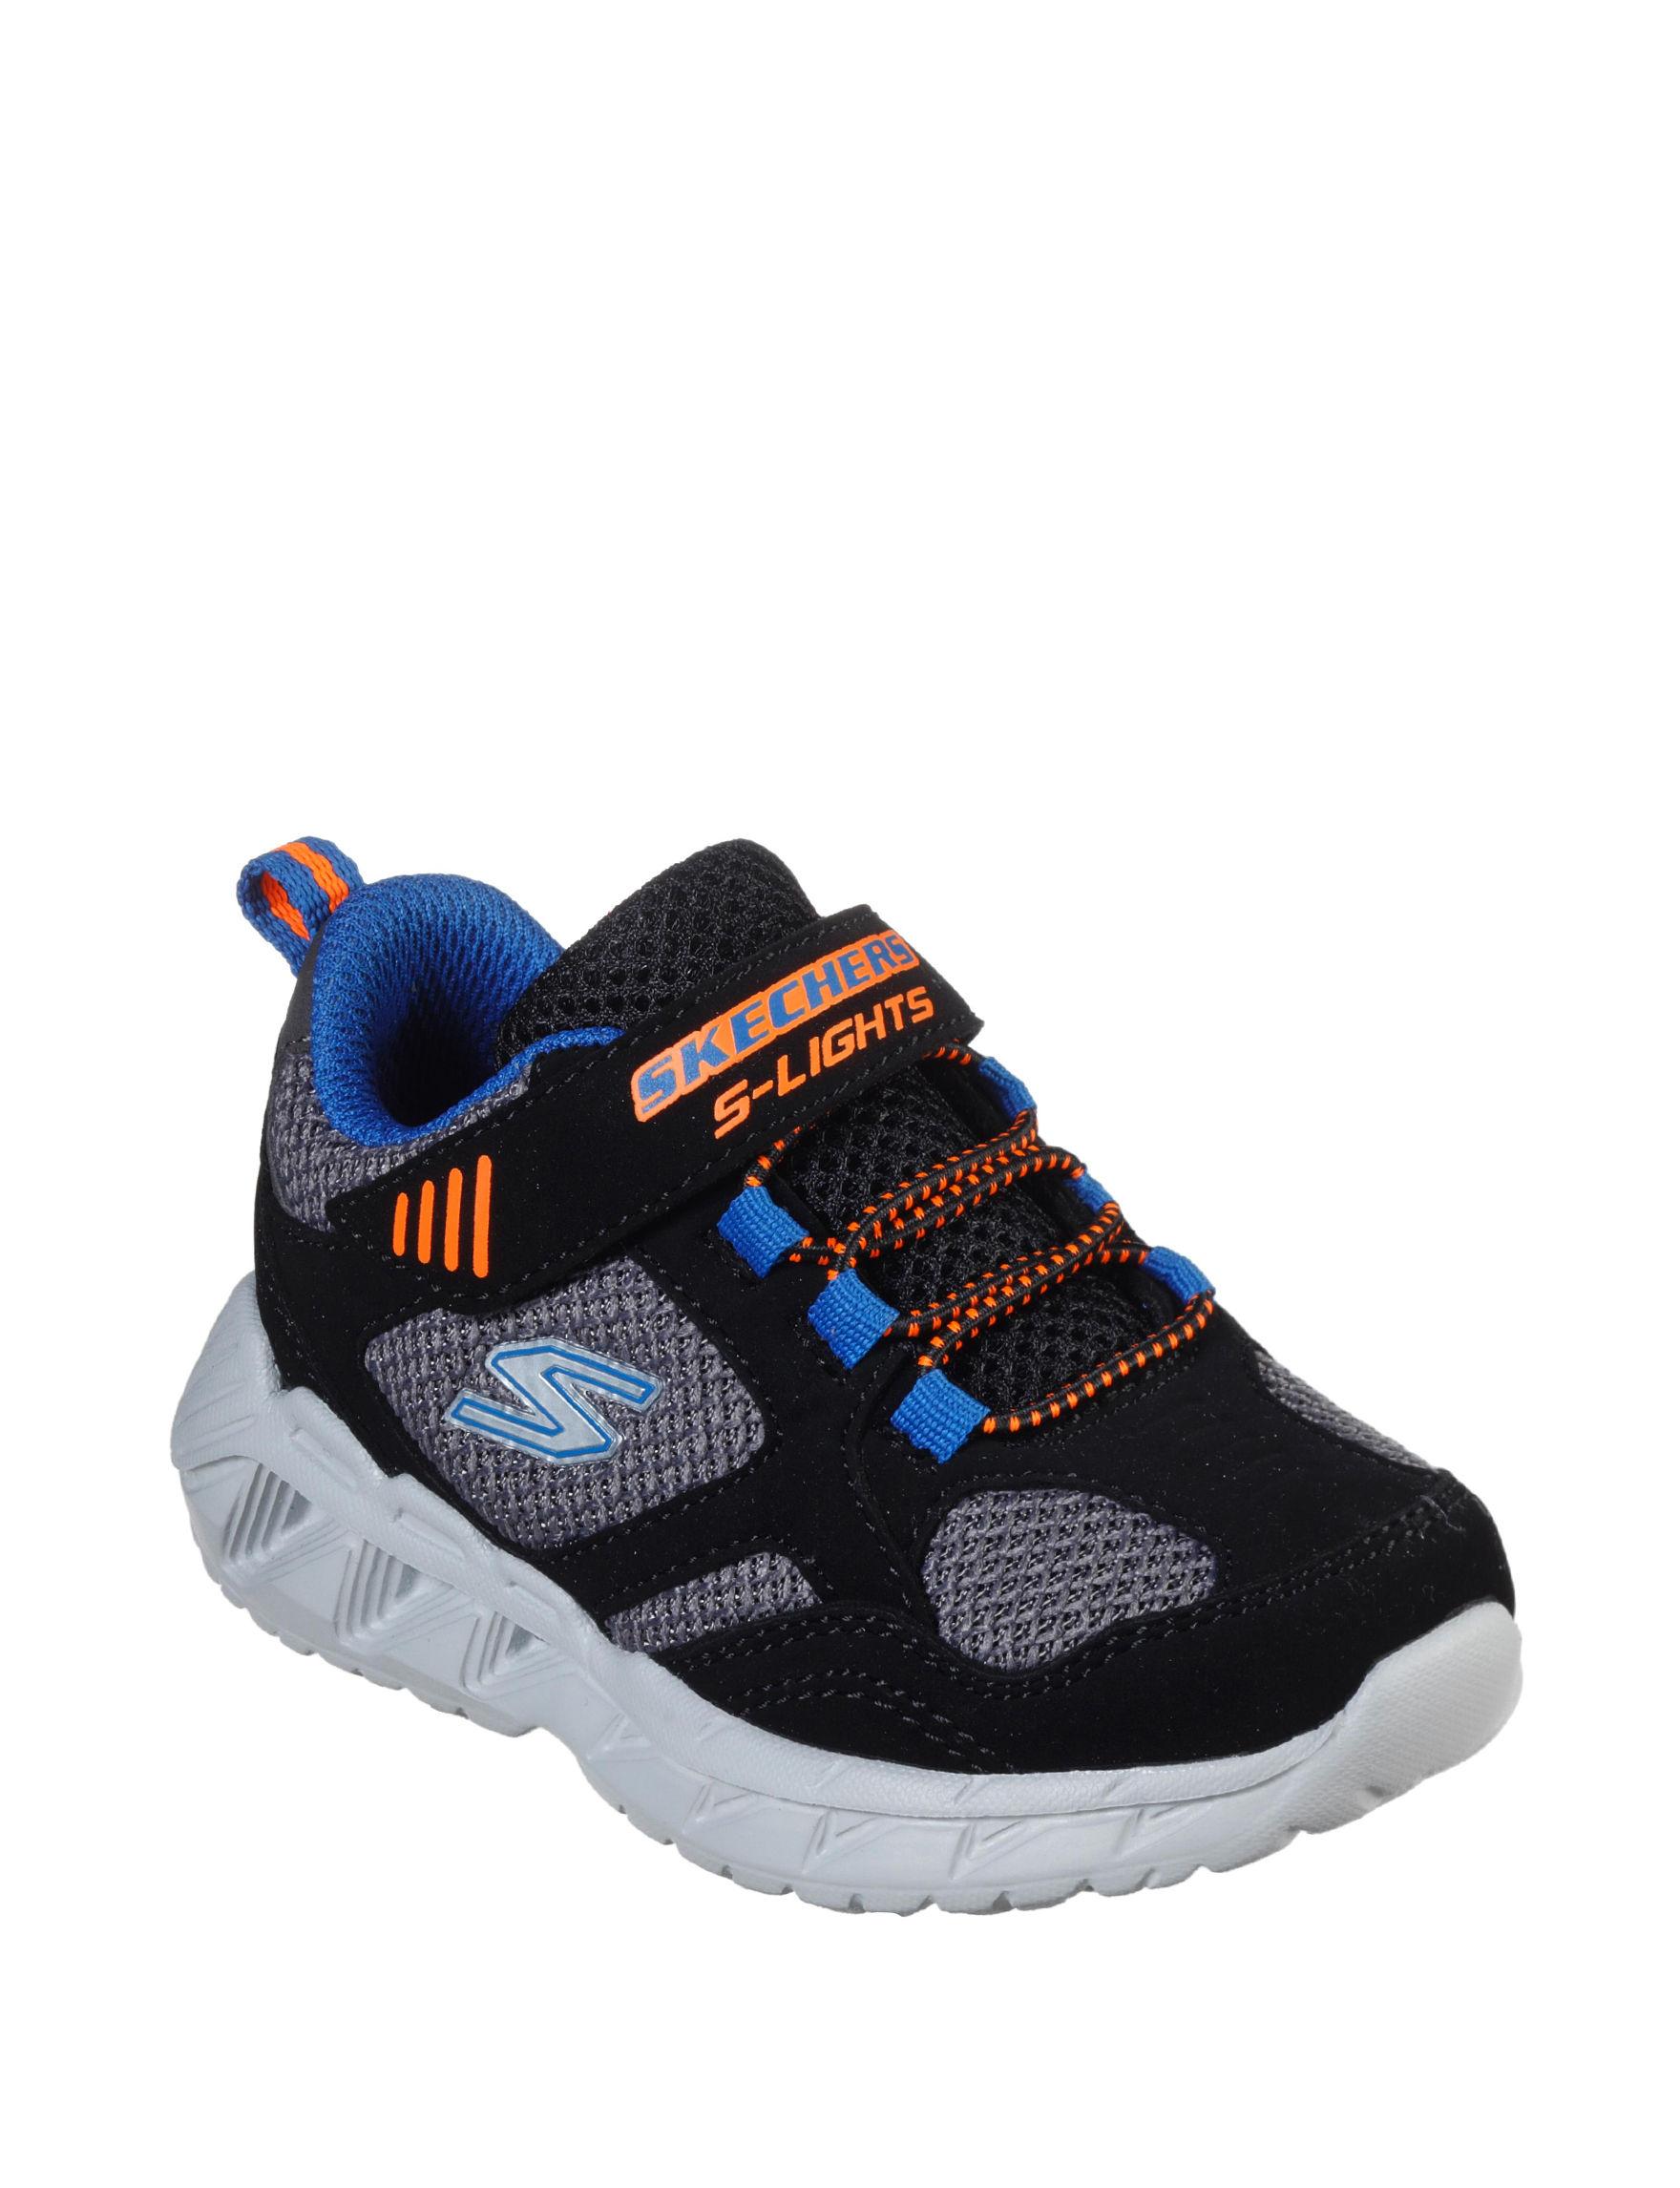 Skechers Black / Blue